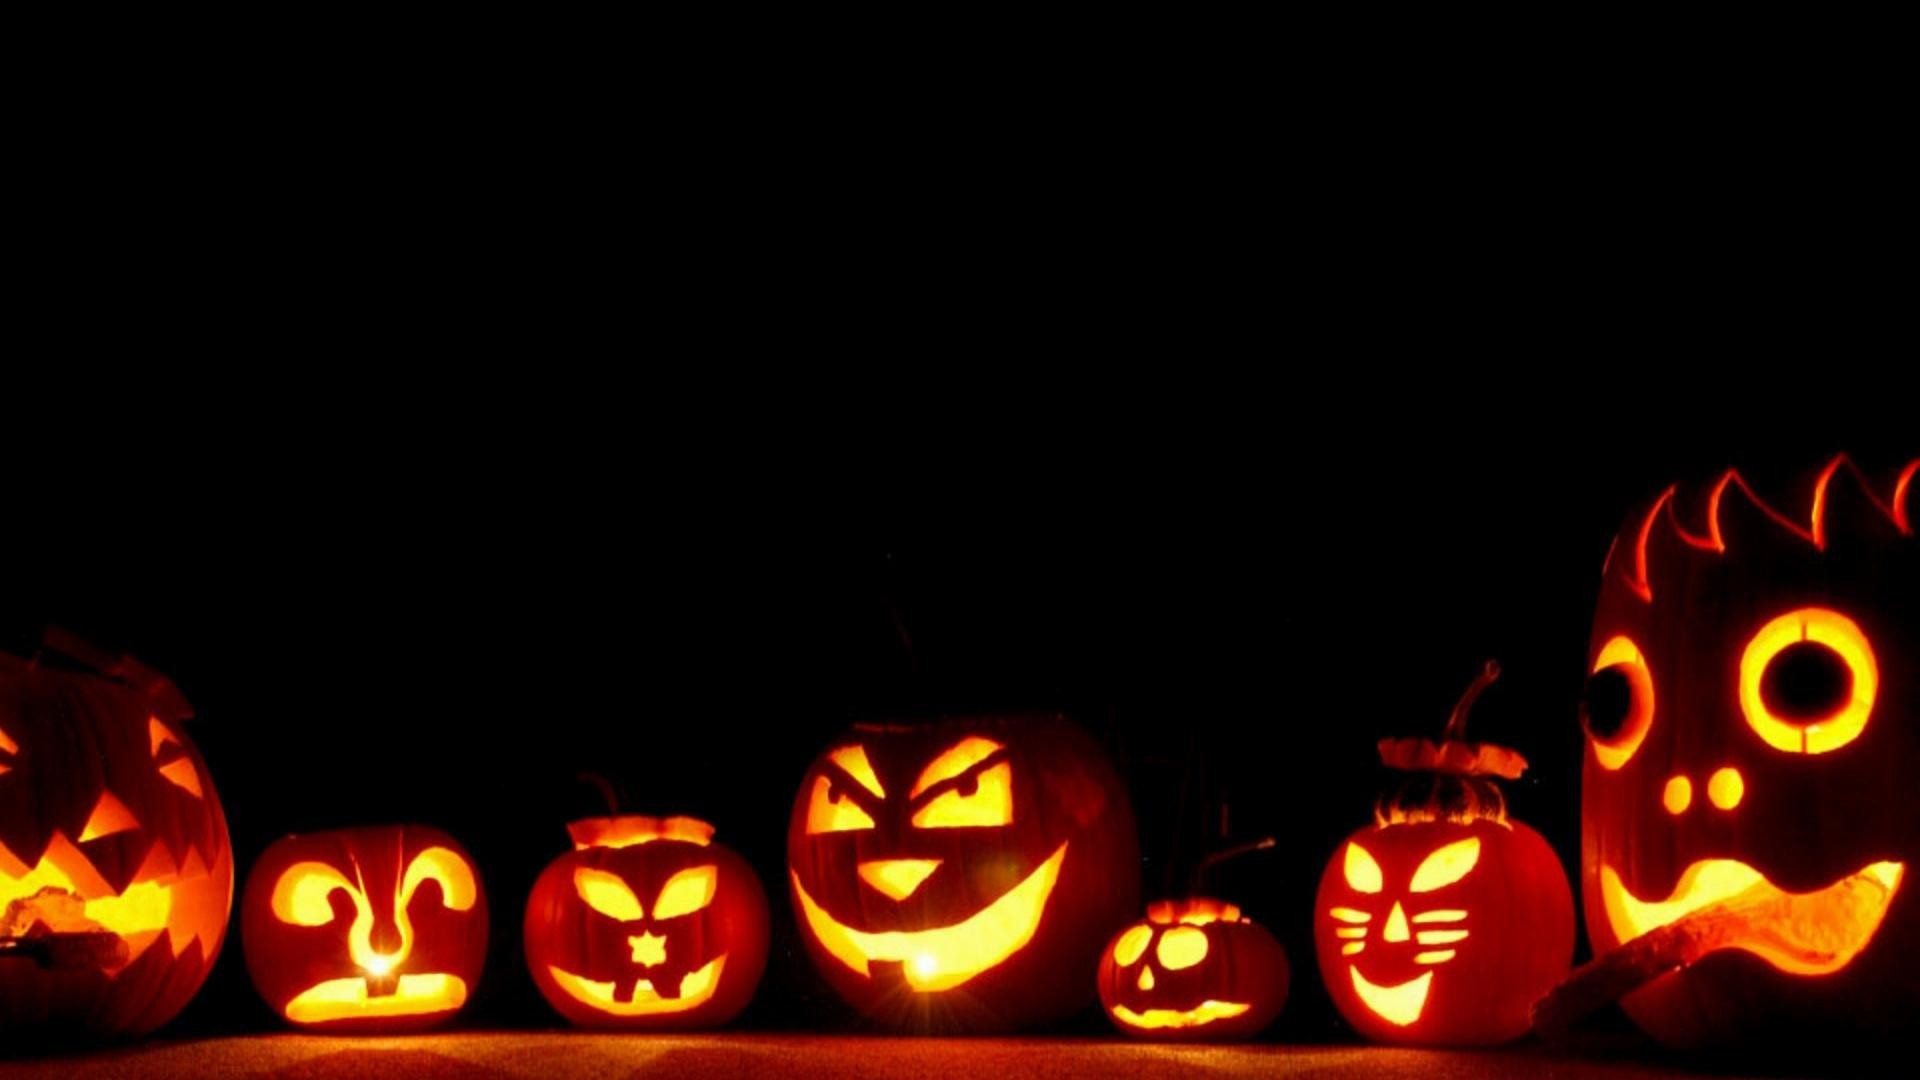 wallpaper.wiki-Halloween-2016-Desktop-Background-PIC-WPB002485